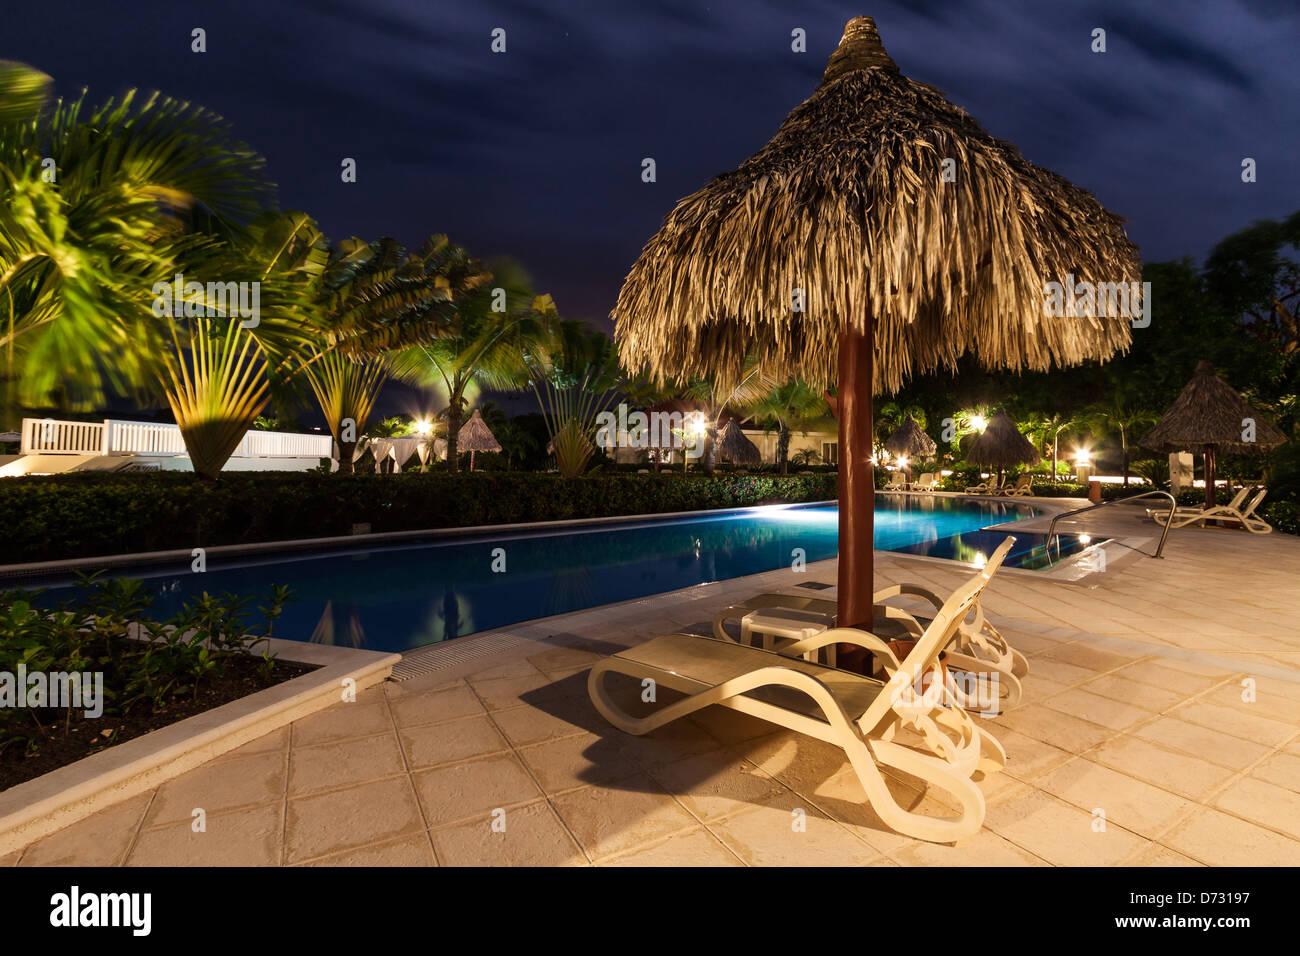 Straw umbrella and two beach seats near an illuminated pool by night - Stock Image